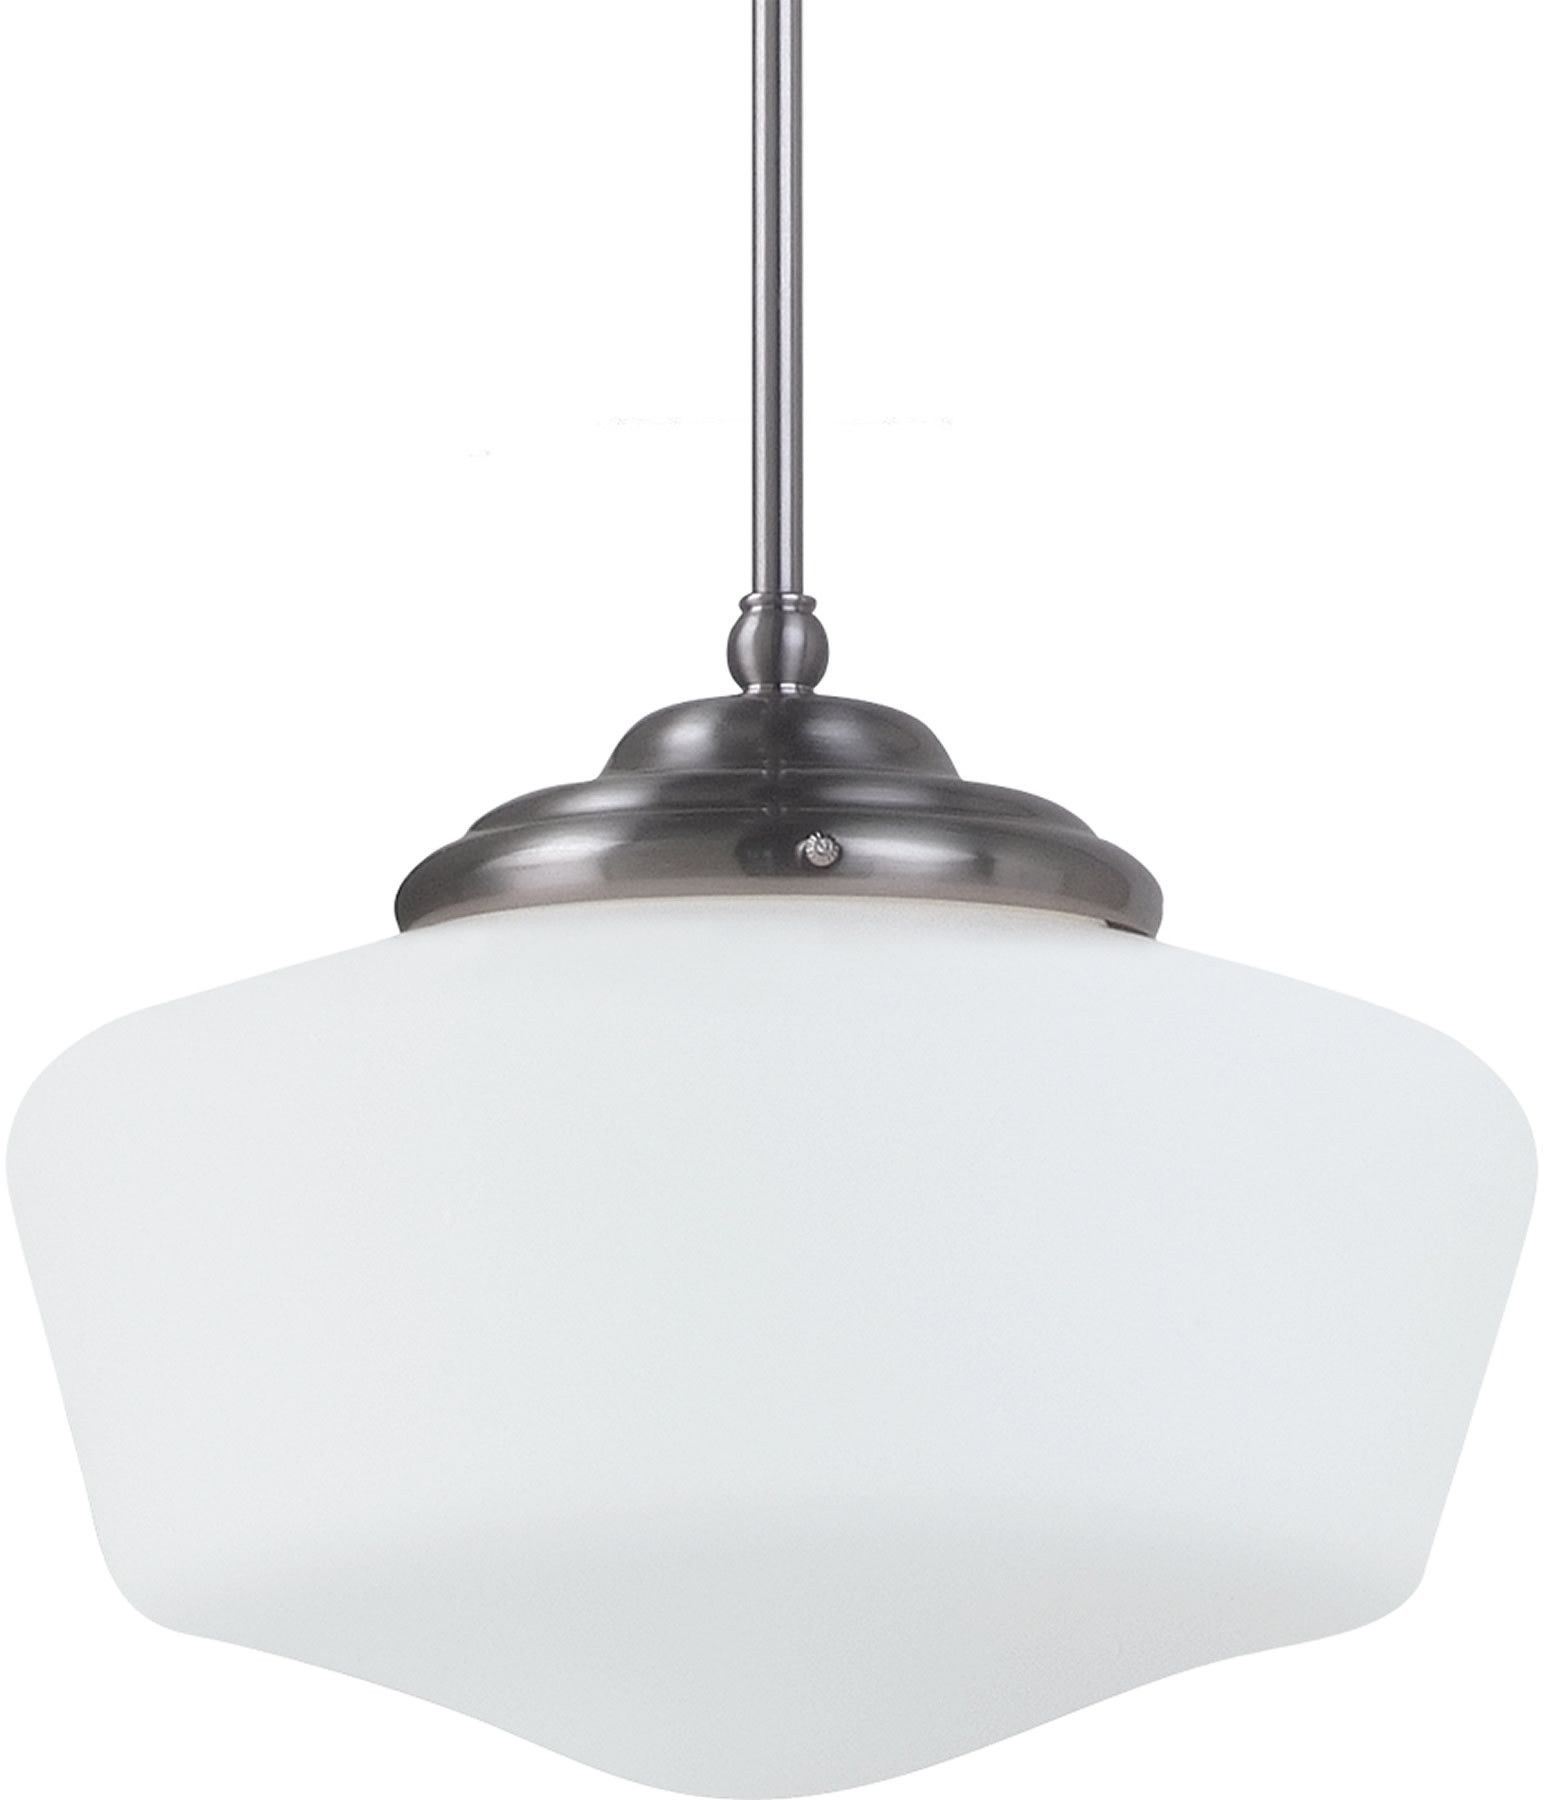 0-016466>Academy 1-Light Pendant Brushed Nickel